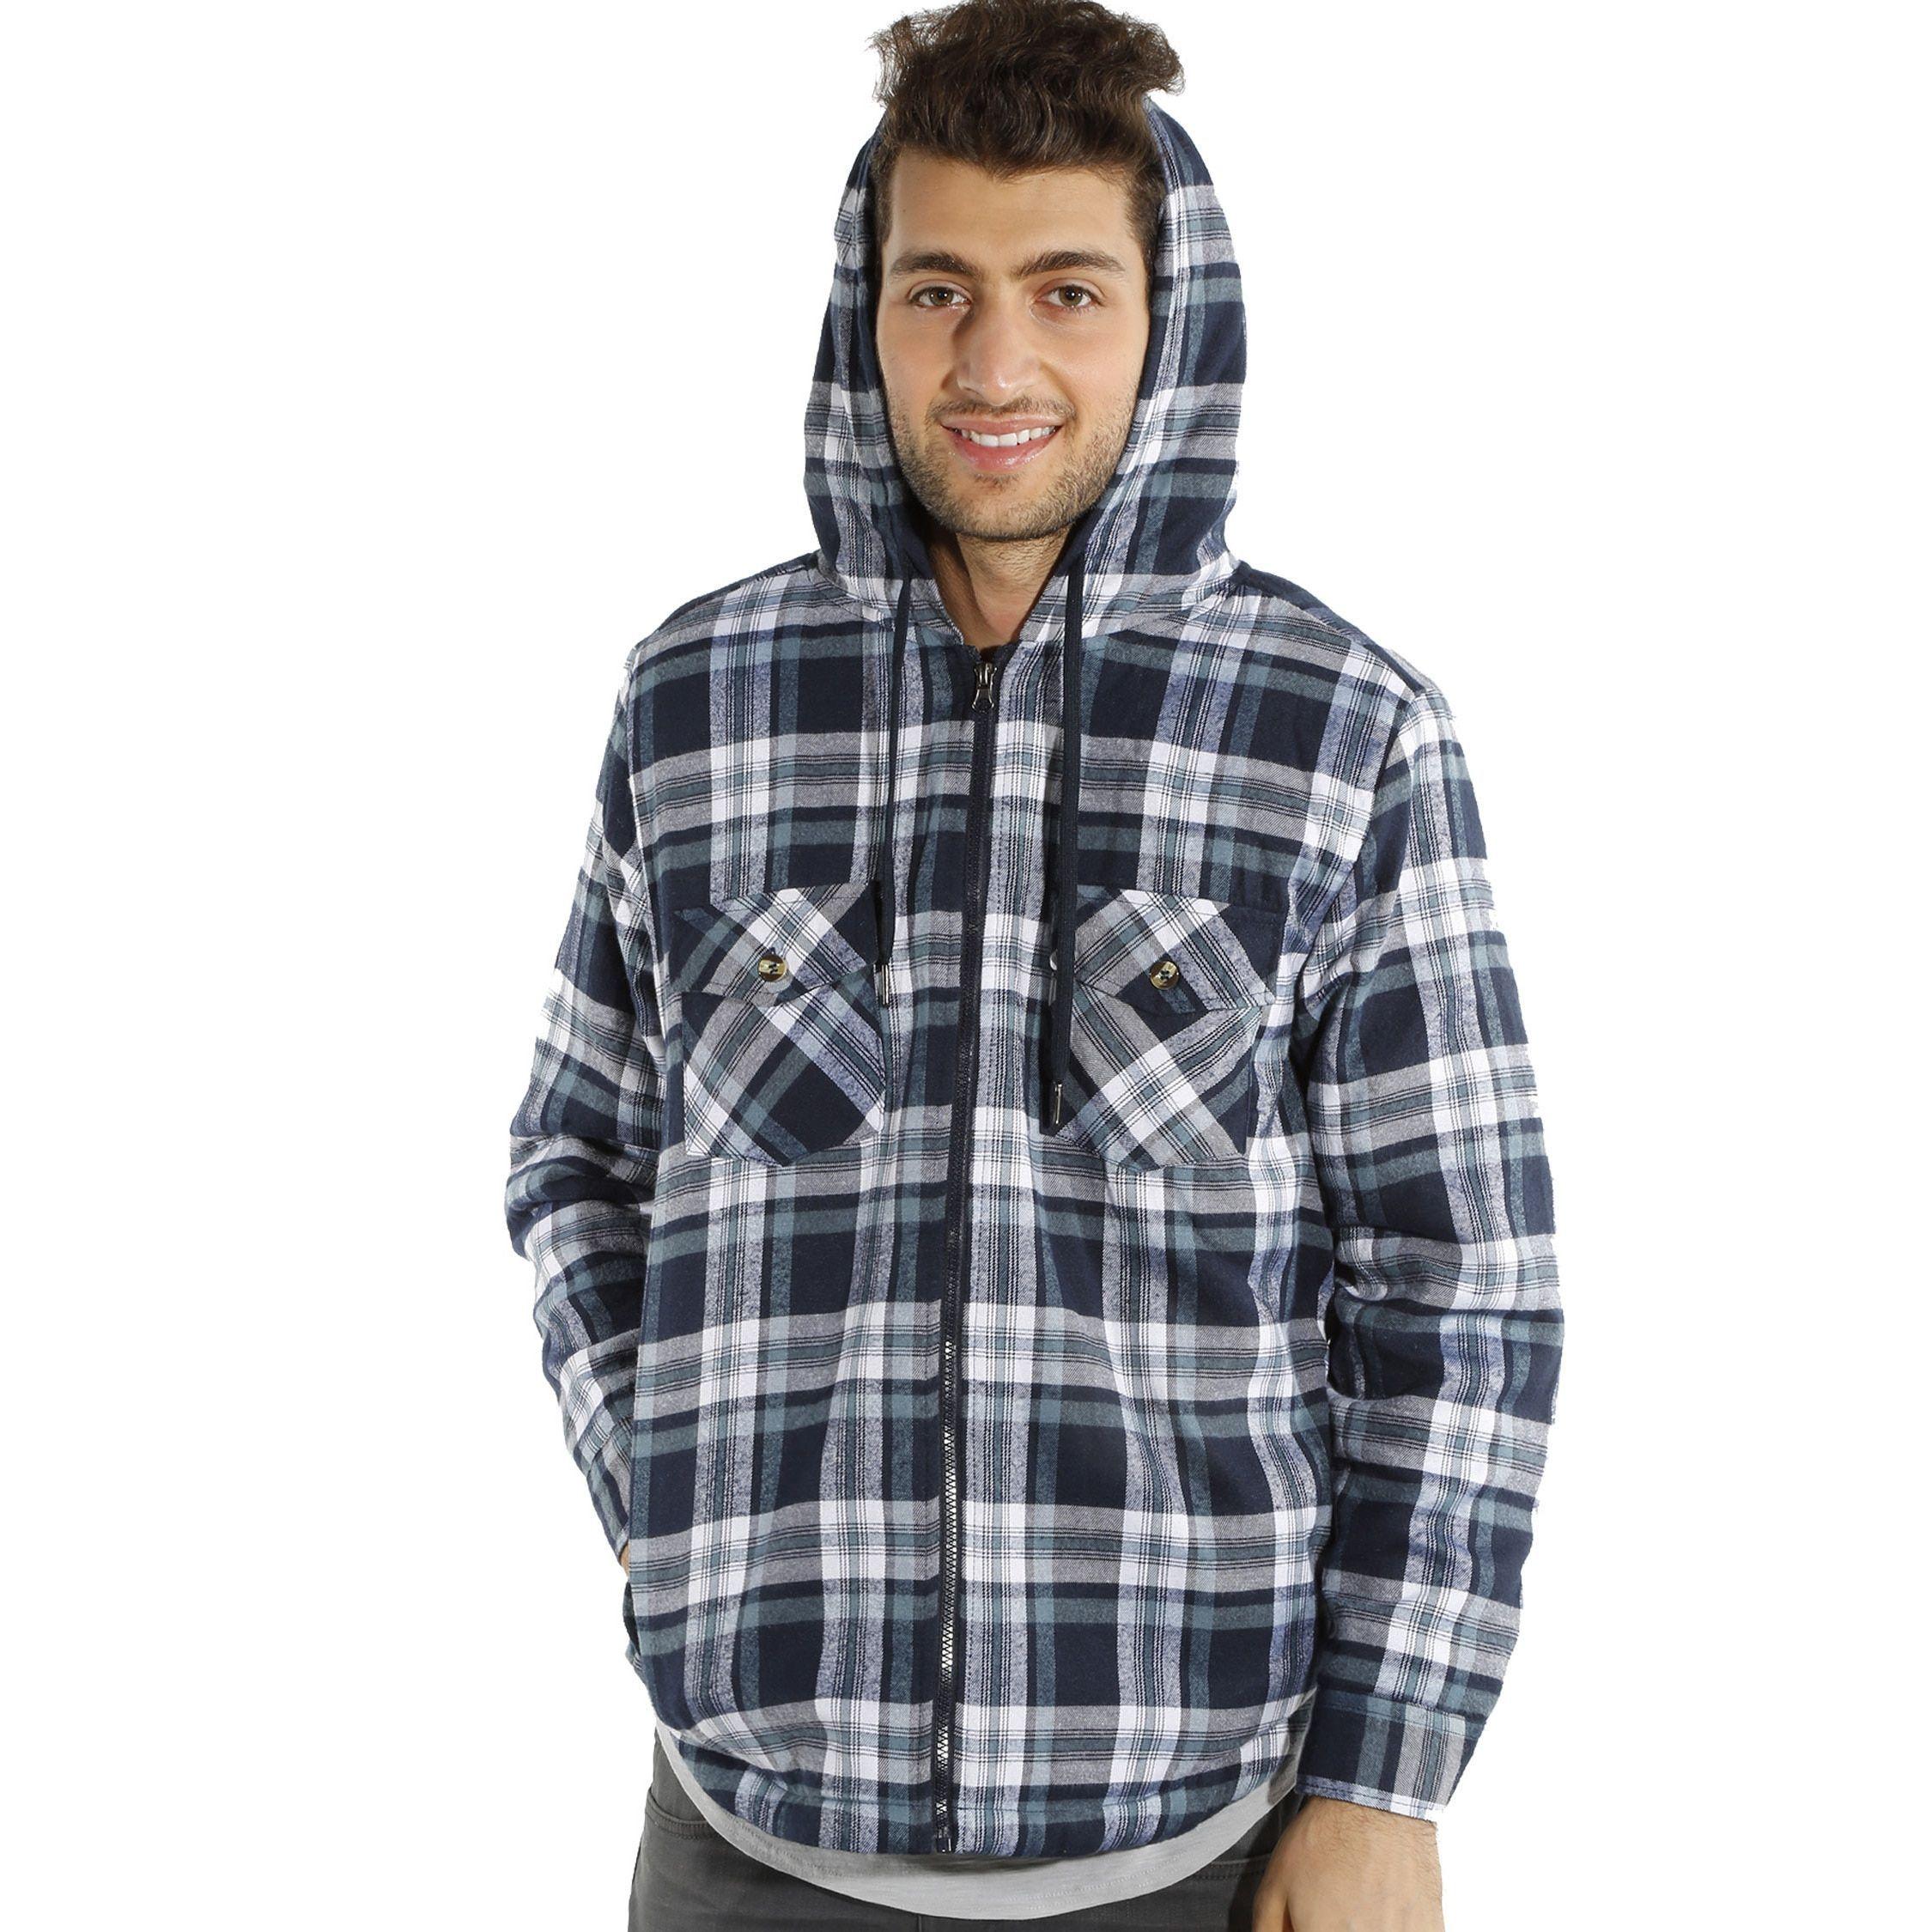 Mens hooded flannel jacket  Menus Hooded Flannel Plaid Hooded Jacket Black Large Size L